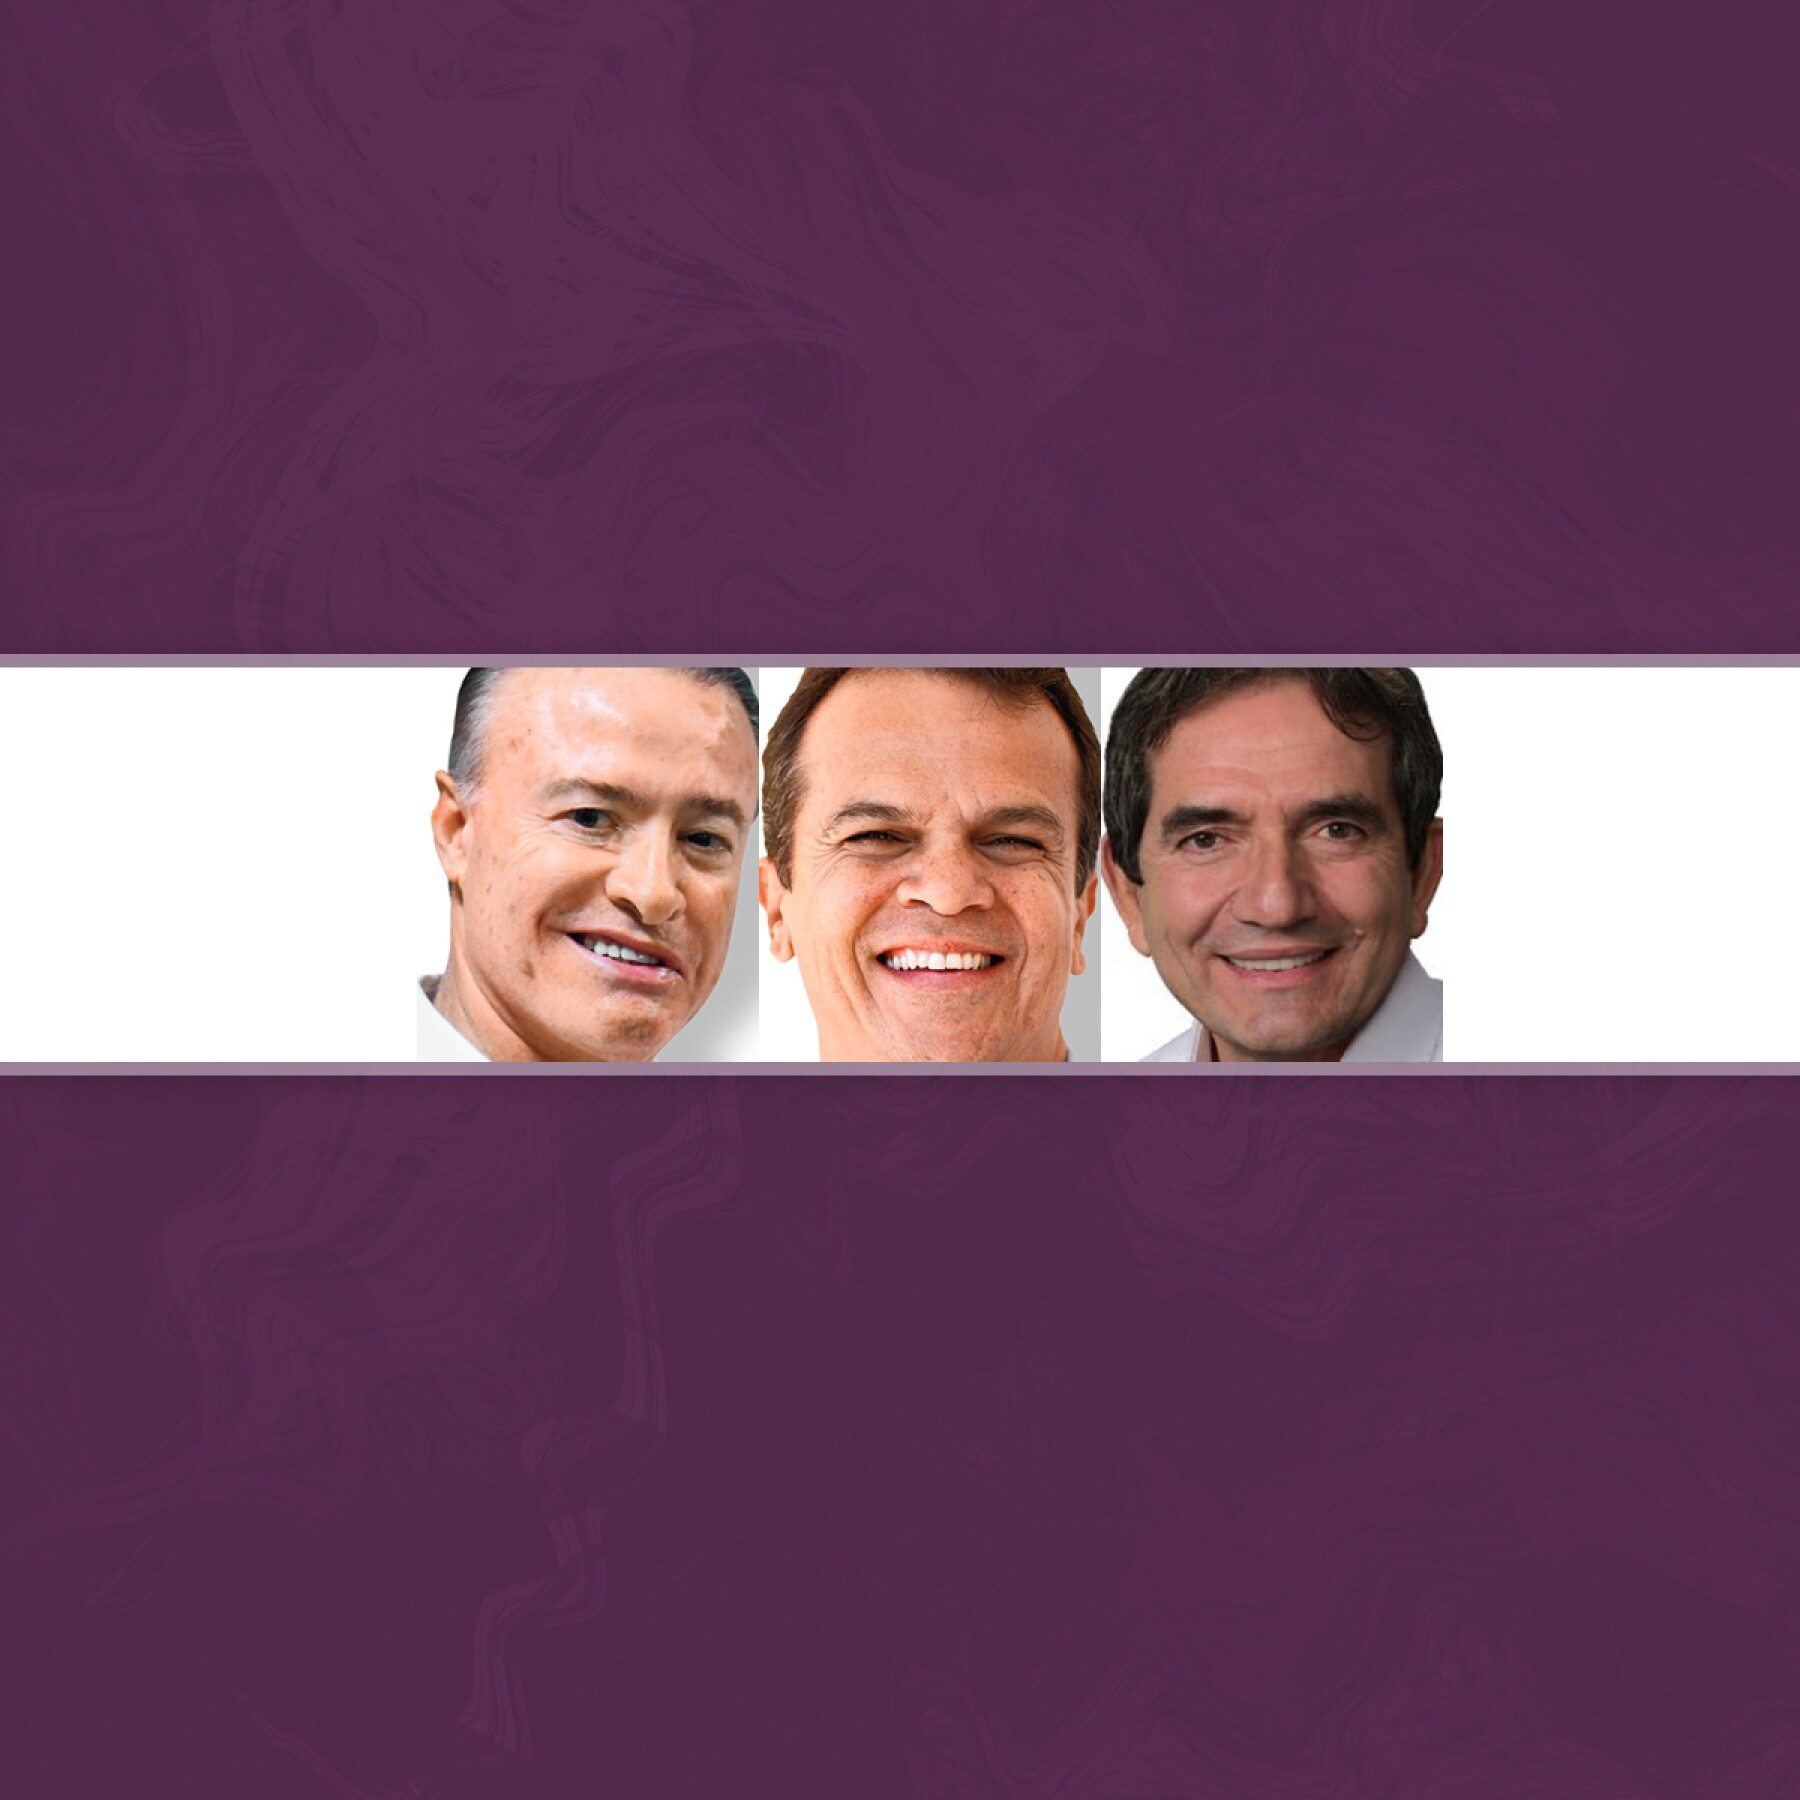 Quirino Ordaz, Martín Heredia y Melesio Cuén.